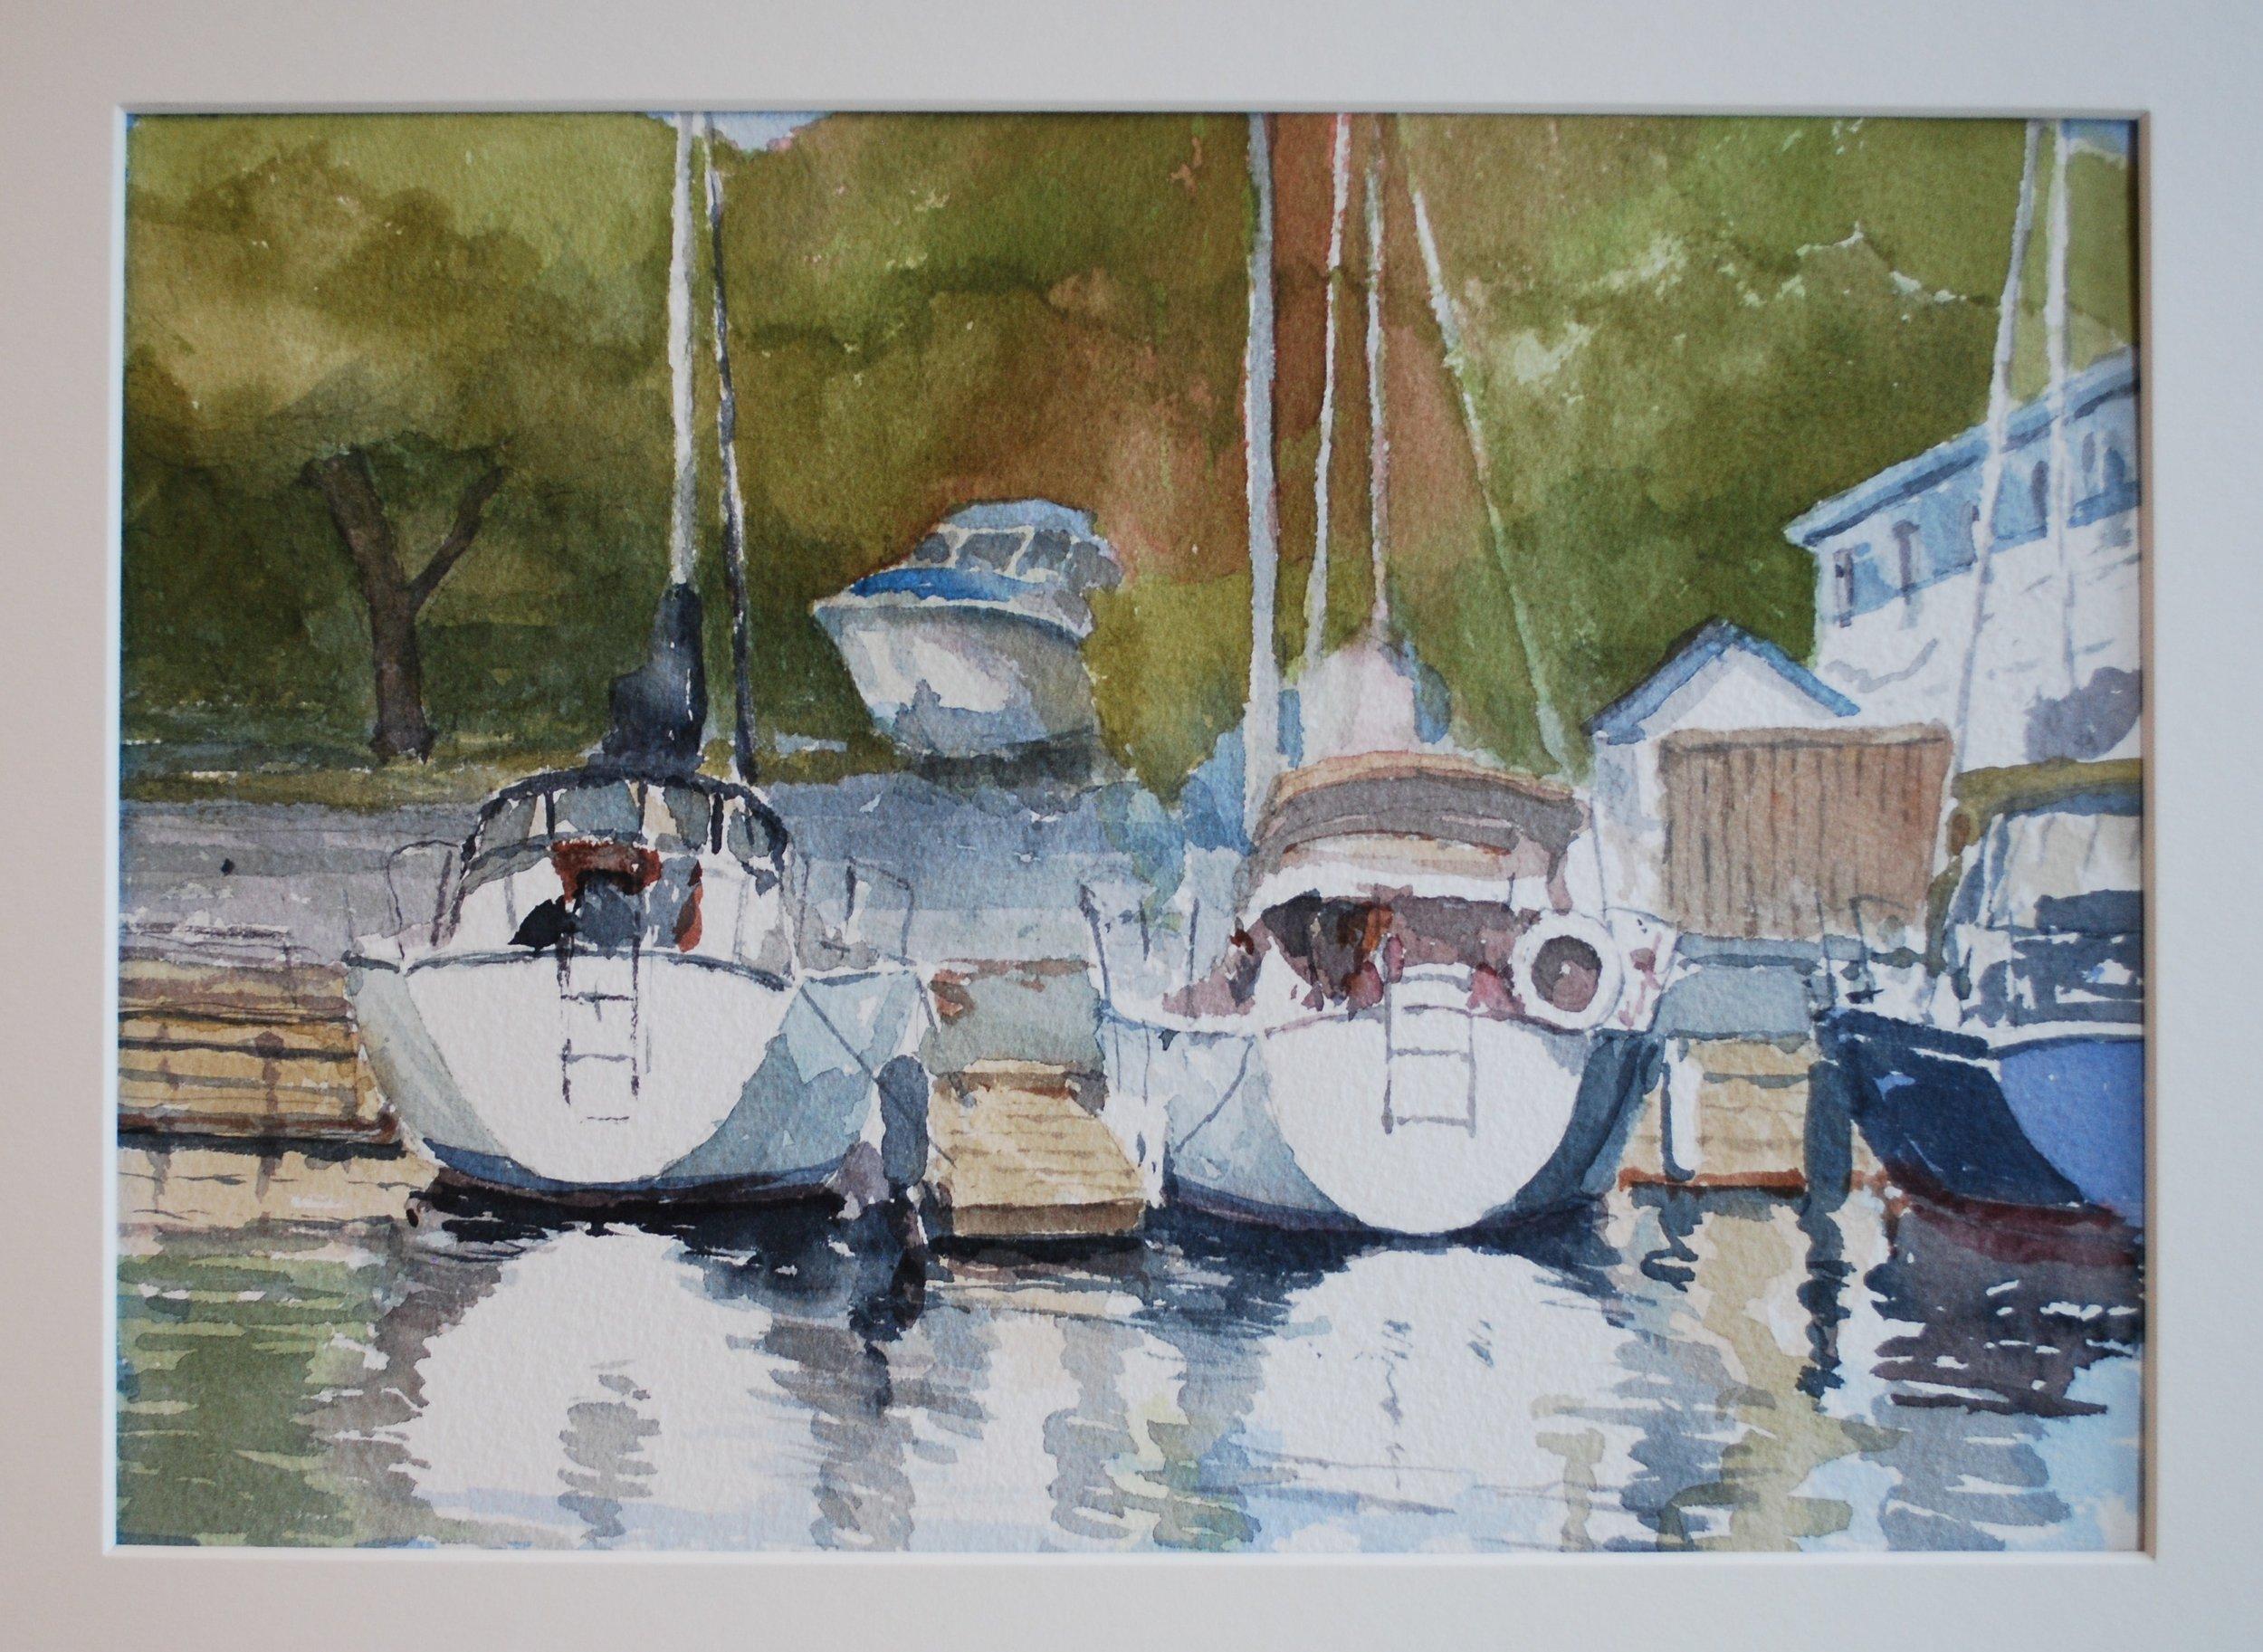 James LePage.Bronte Yacht Club, Watercolour. Plein Air painting, 10 x 12 (1).JPG